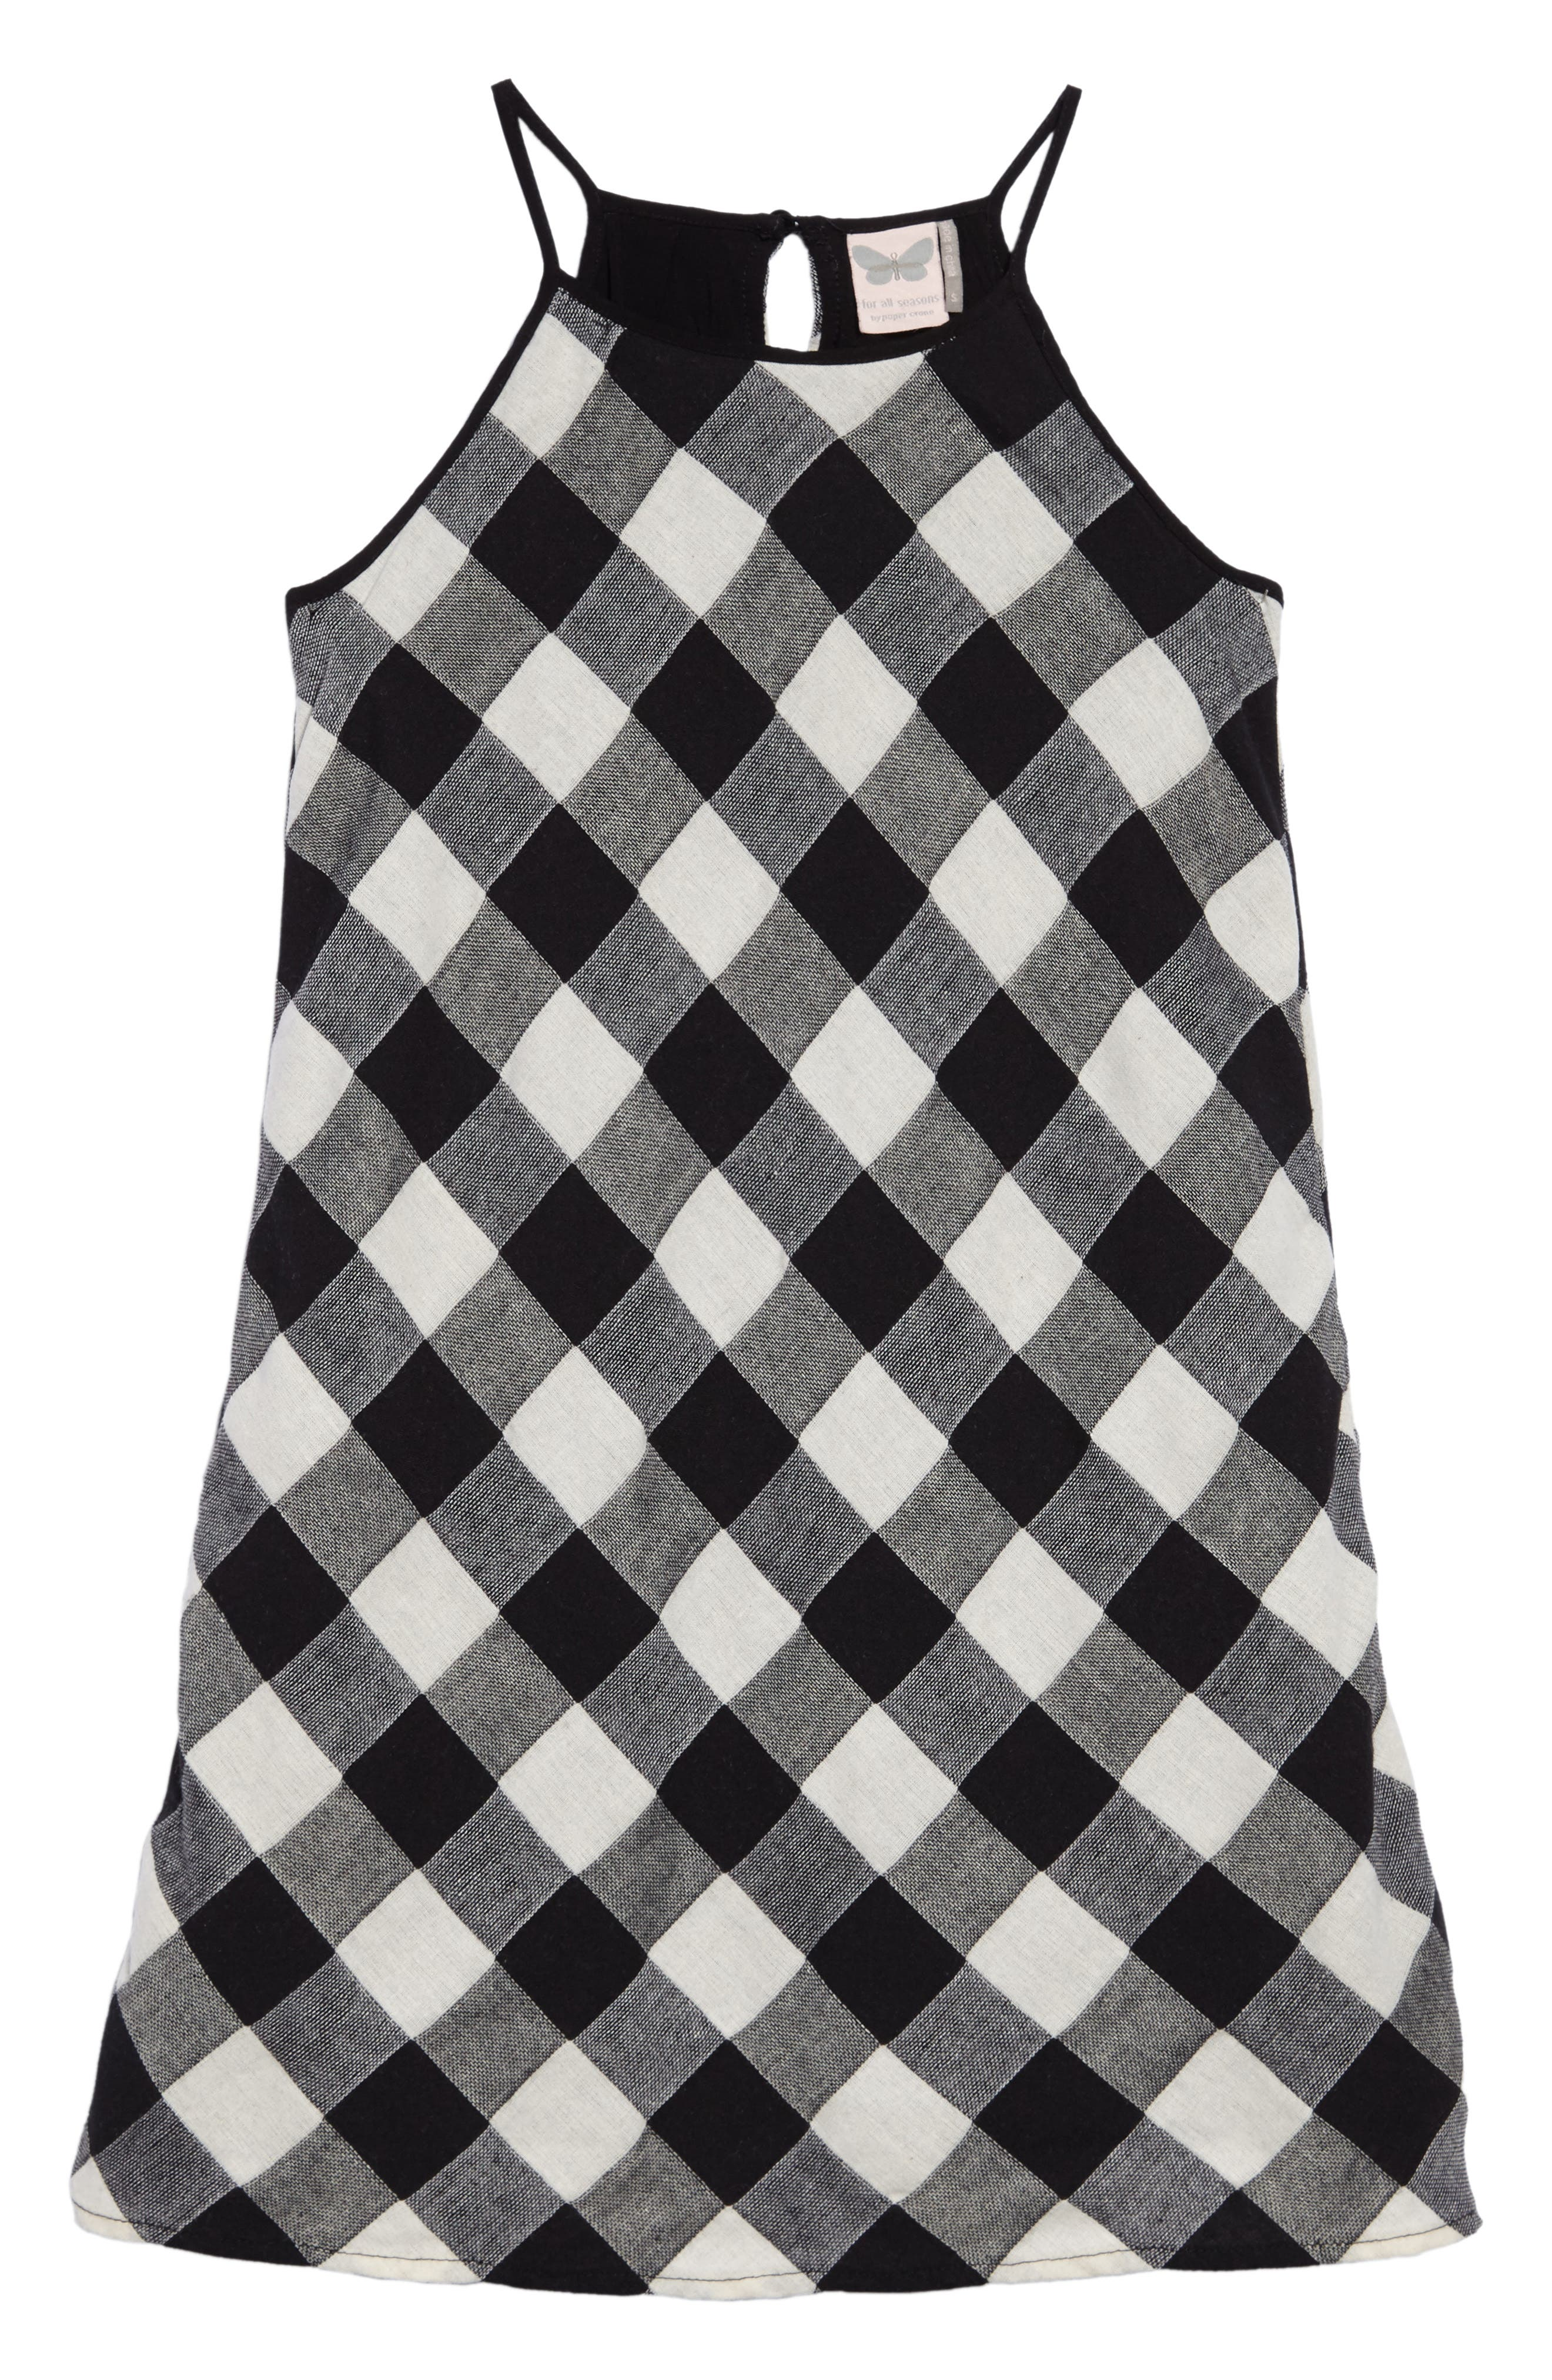 Gingham Tank Dress,                             Main thumbnail 1, color,                             Blk/ White